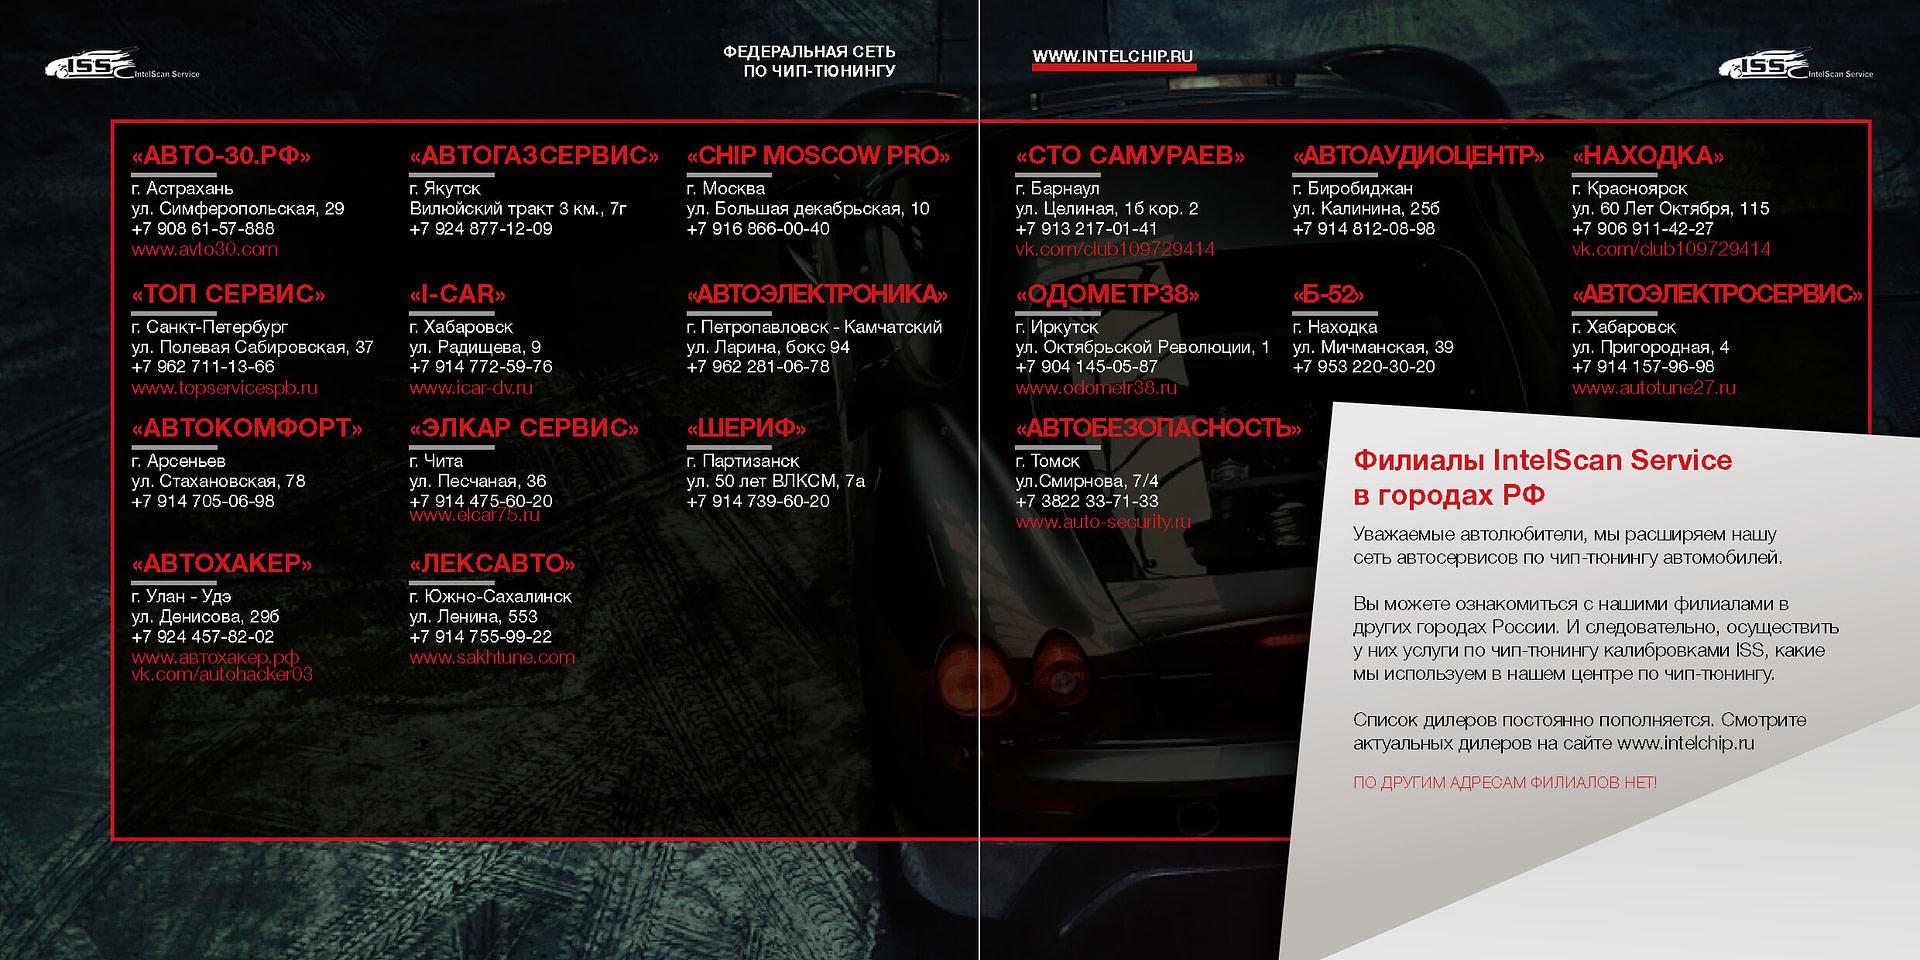 Маркетинг_кит-IntelScan_Servis8